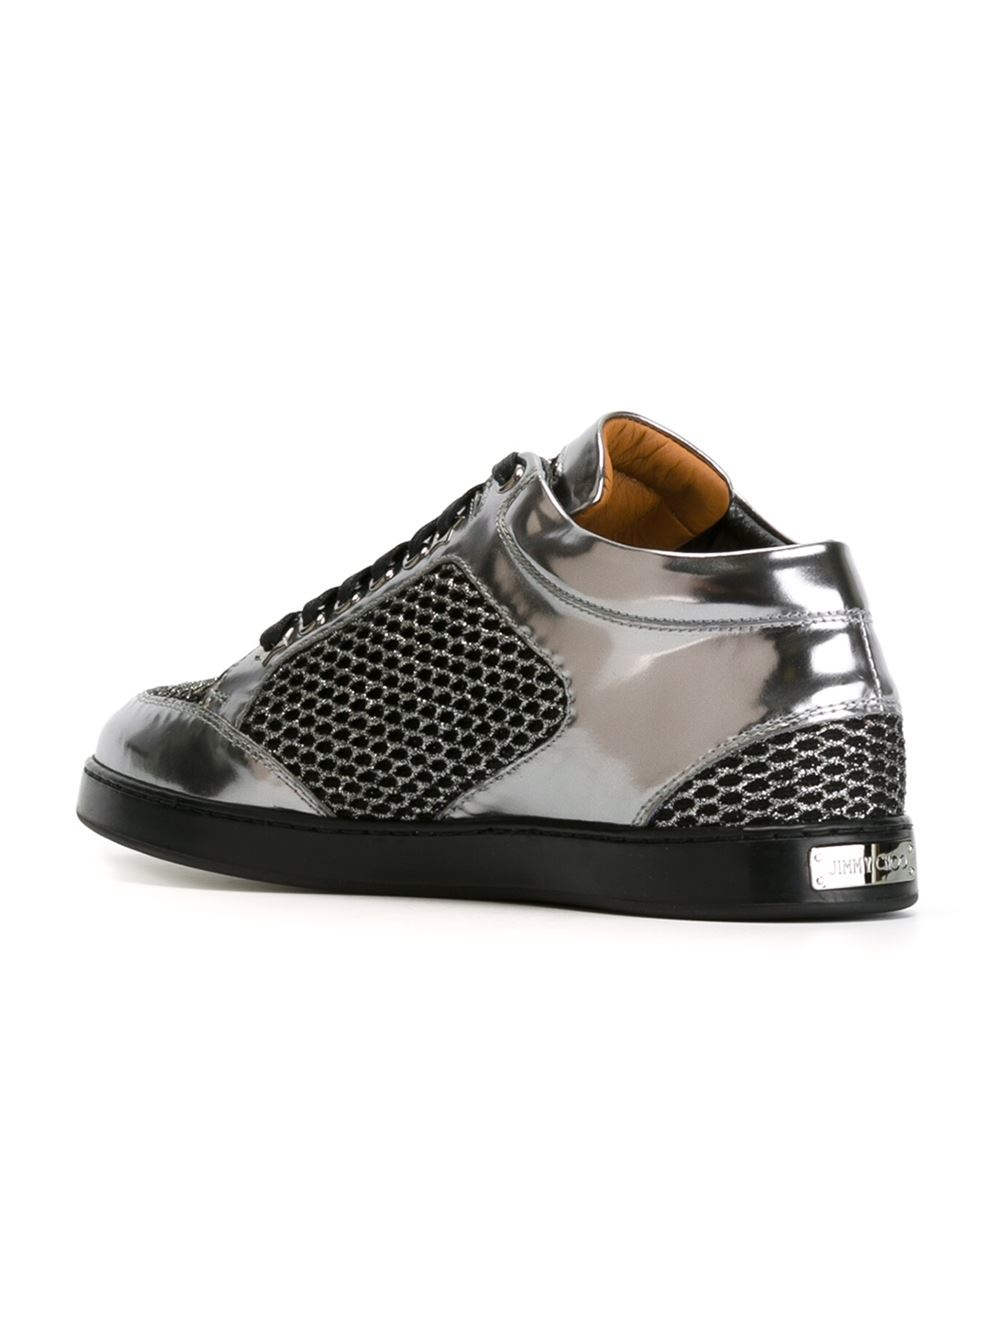 jimmy choo 39 miami 39 sneakers in silver metallic lyst. Black Bedroom Furniture Sets. Home Design Ideas